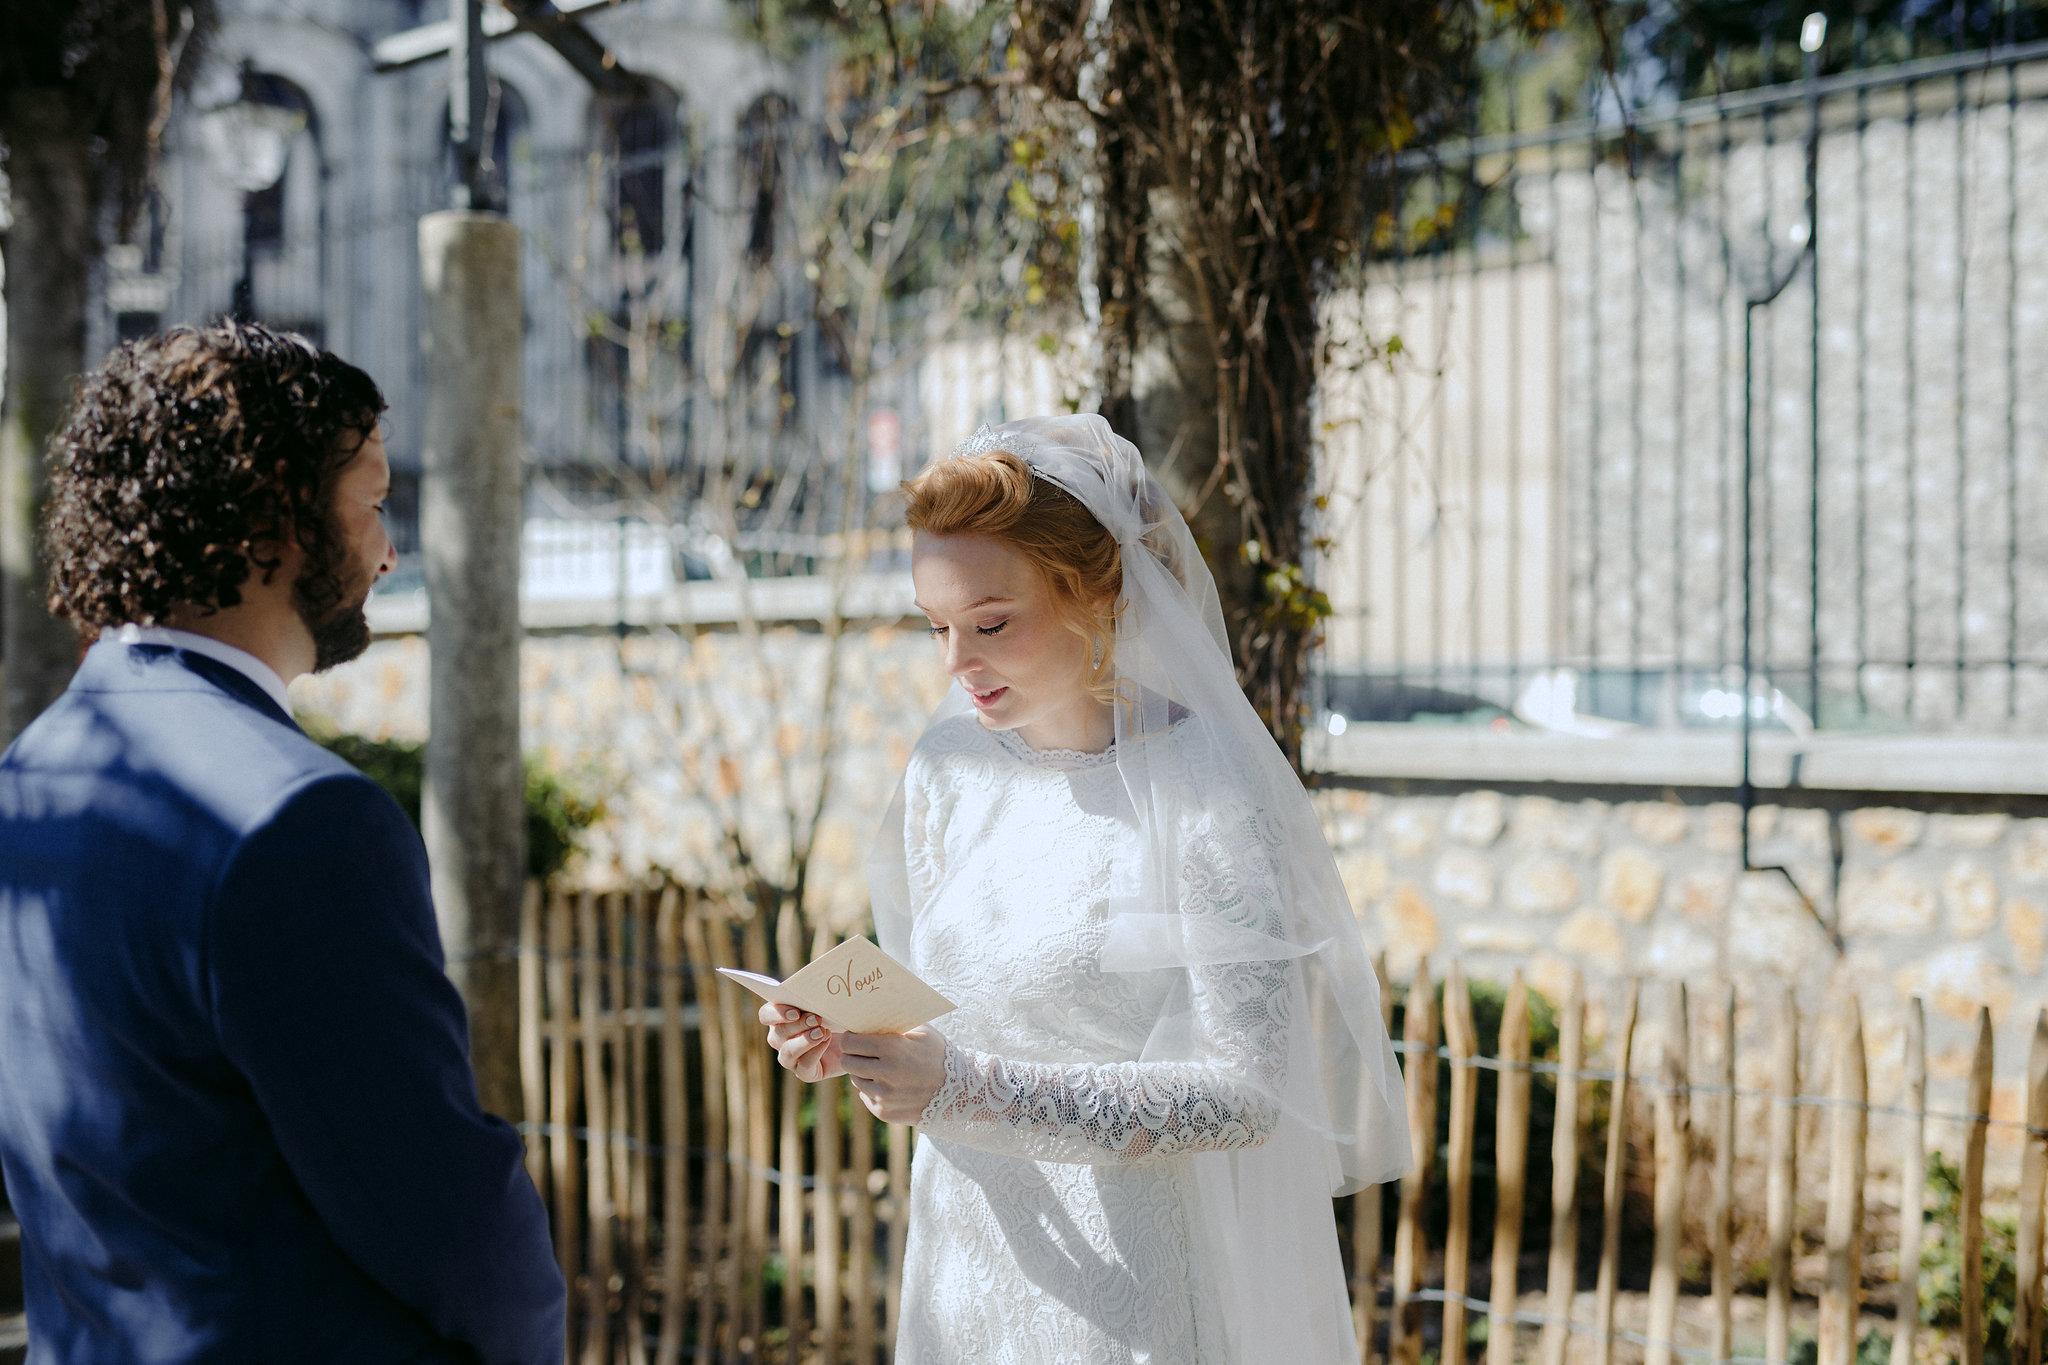 Paris_elopement_wedding_photographer-192.jpg